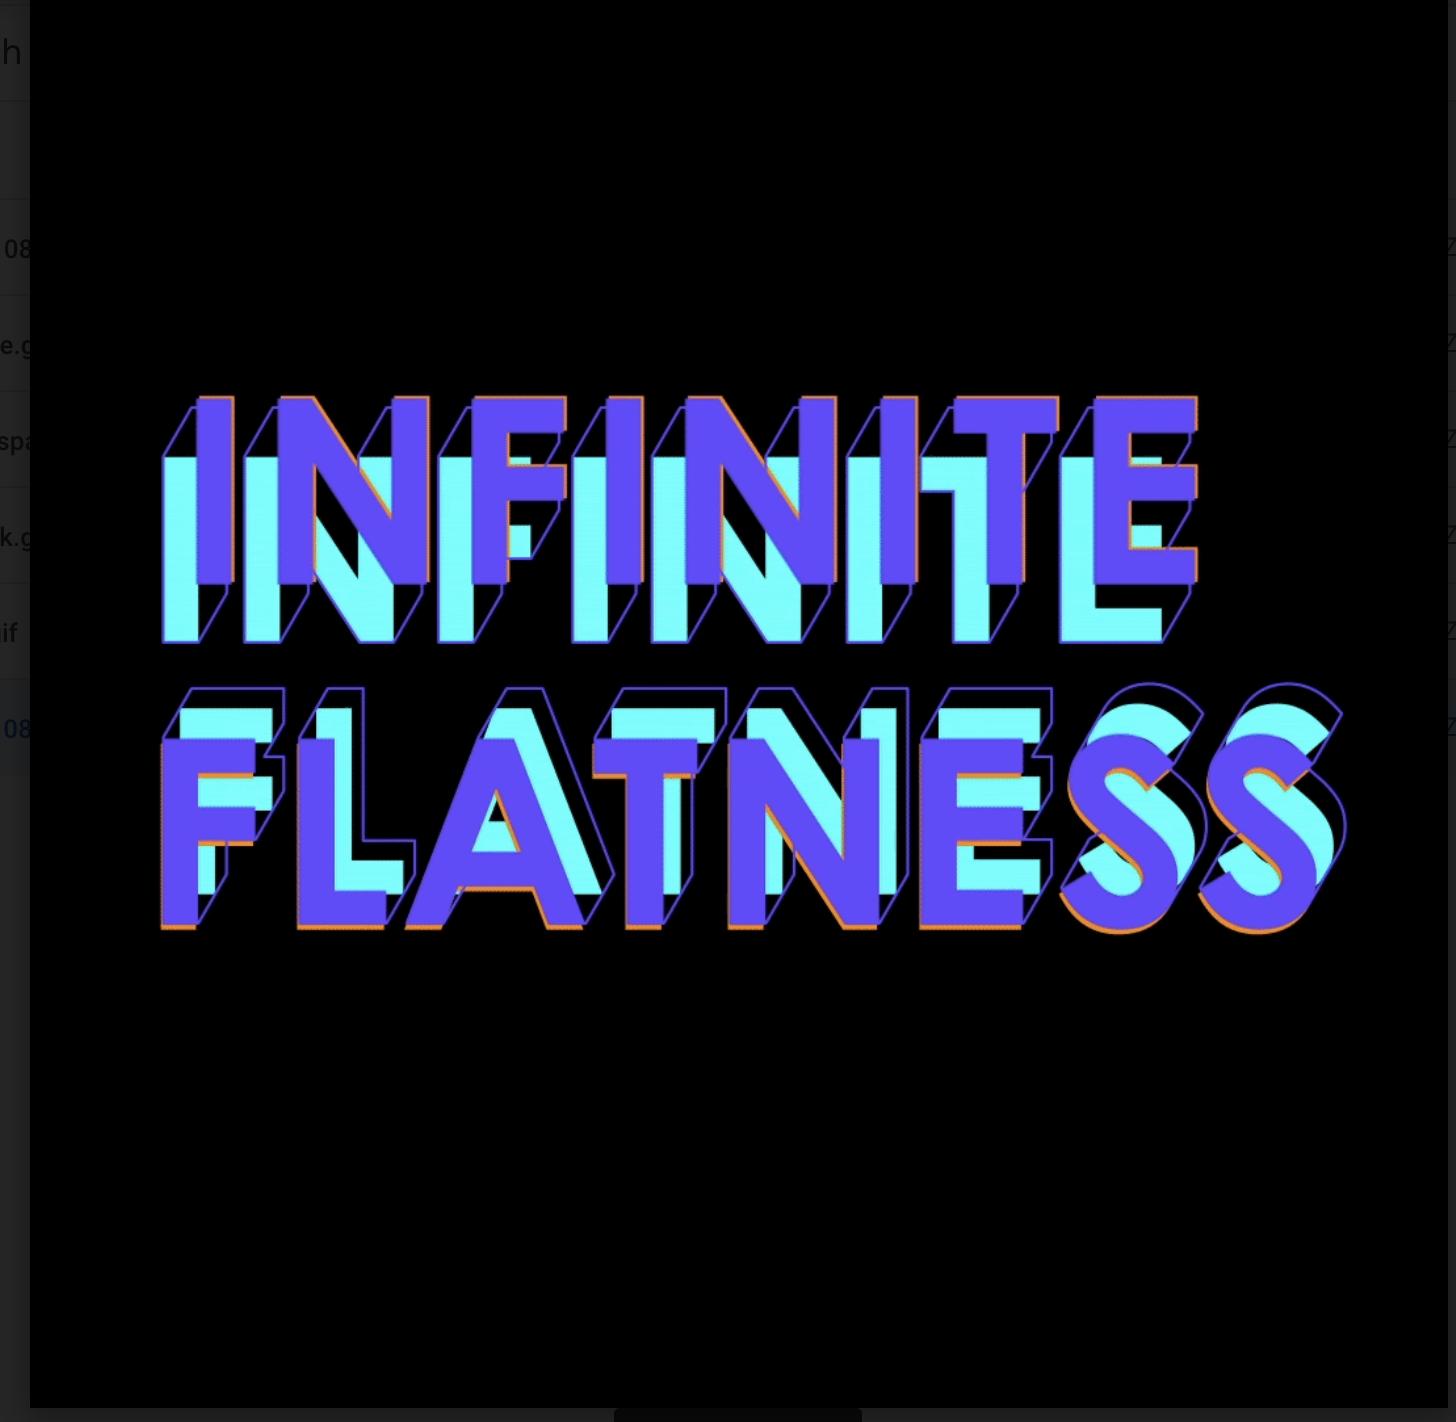 MFA Design Infinite Flatness thesis show 2020